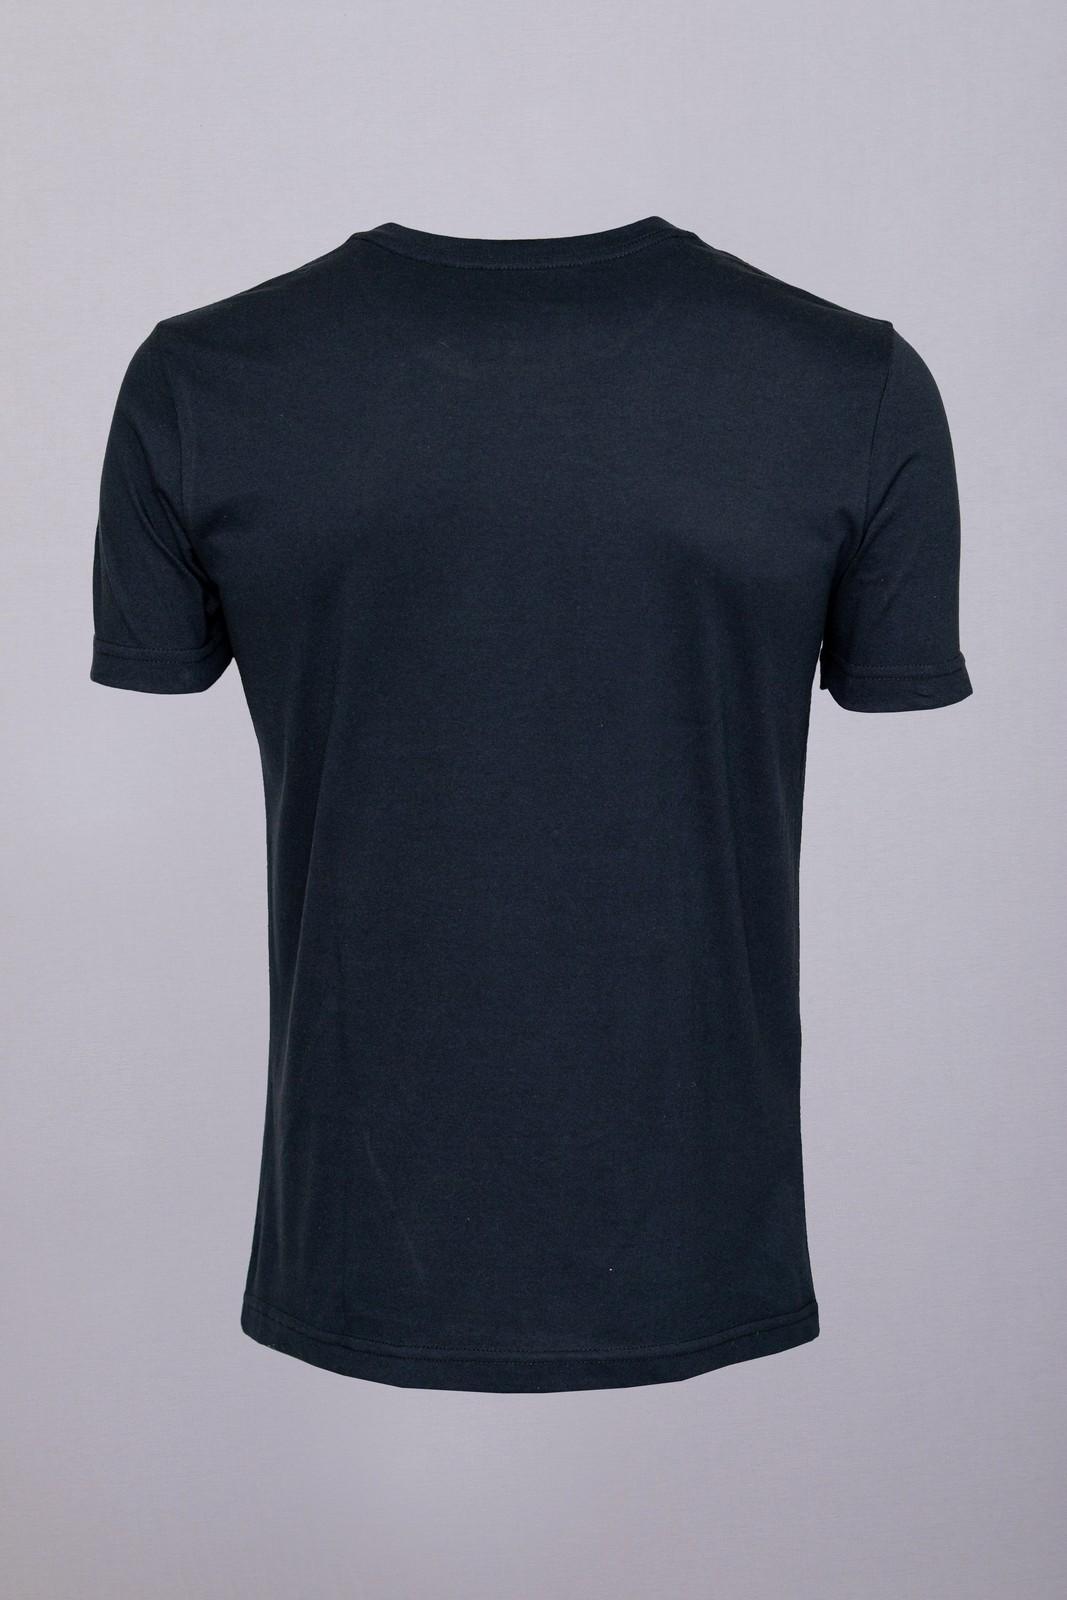 Camiseta Barrocco Kombi Preta